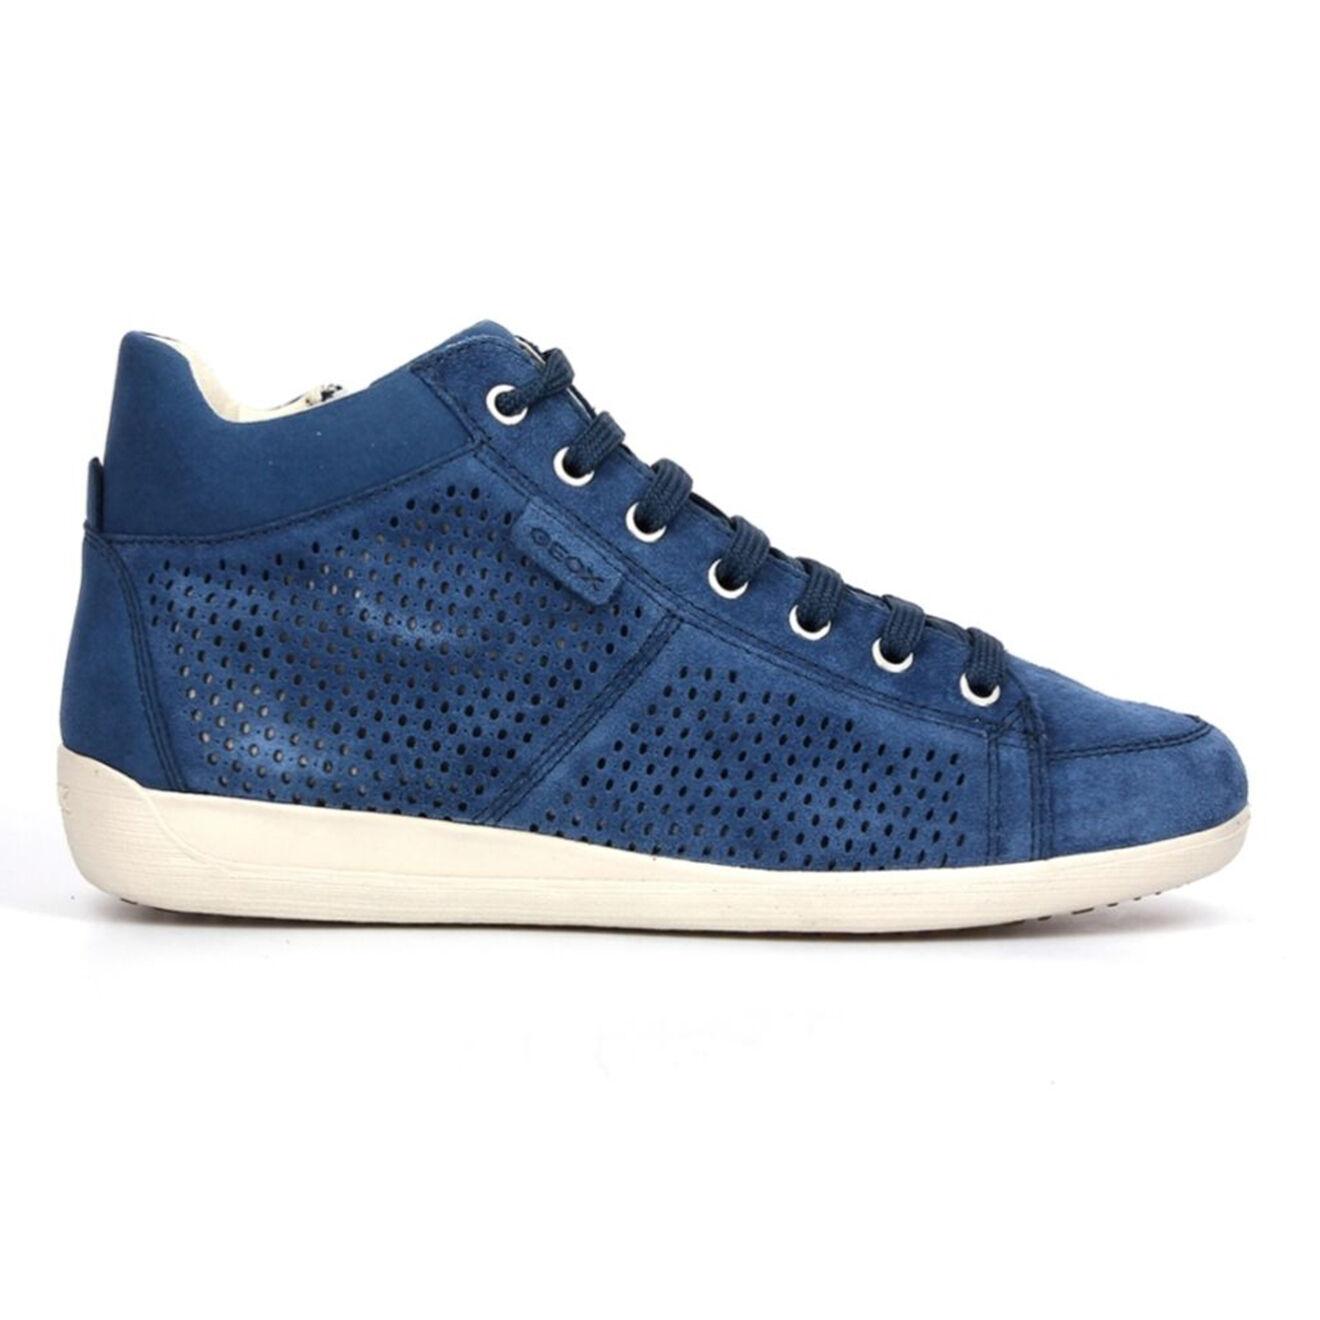 Geox Baskets en Velours de Cuir perforé bleu moyen